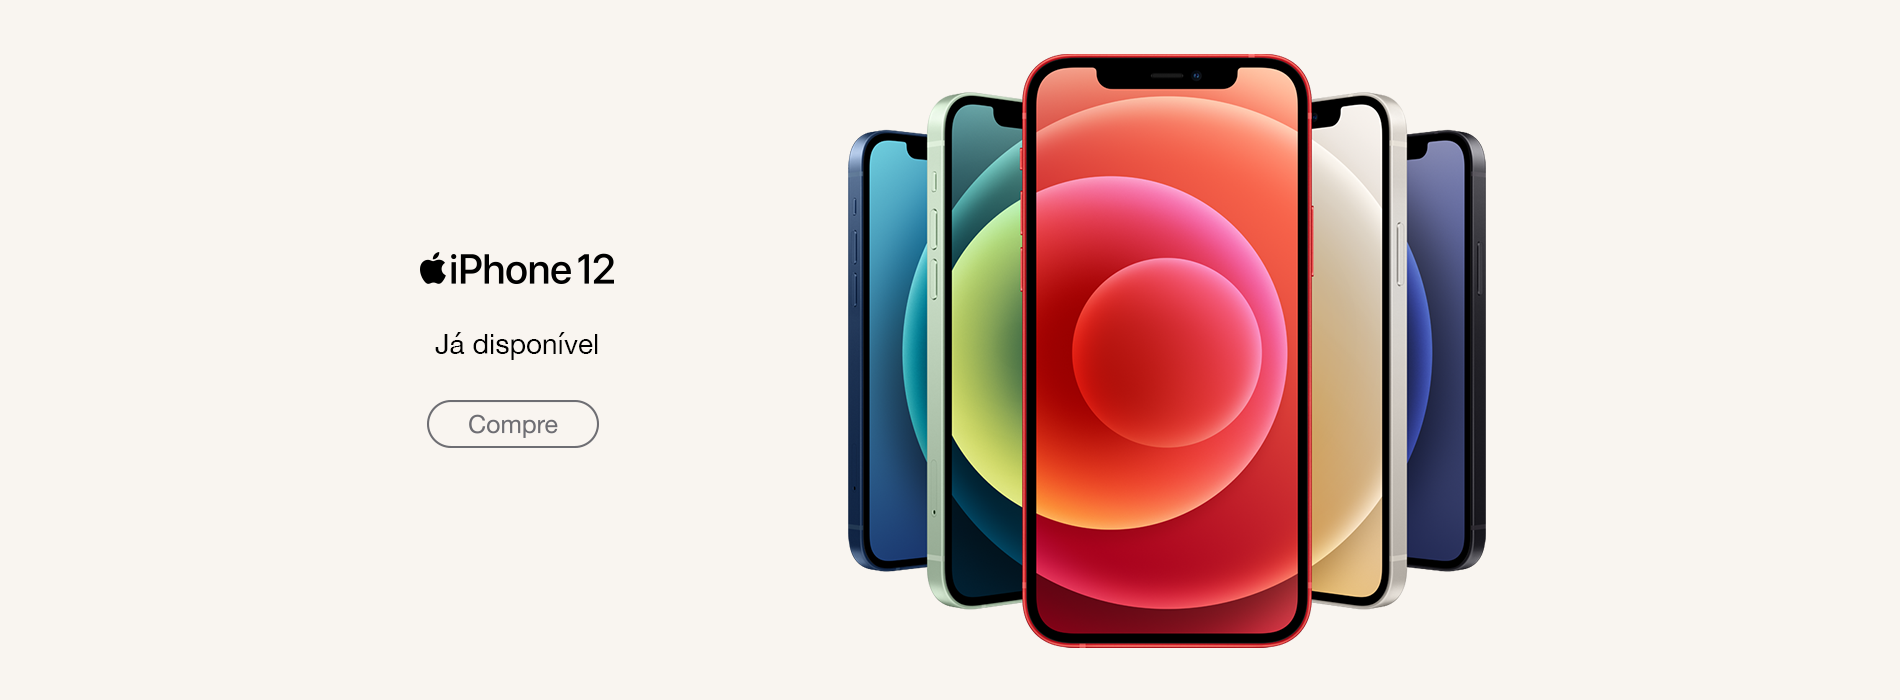 Categoria iPhone - iPhone 12 - comprar